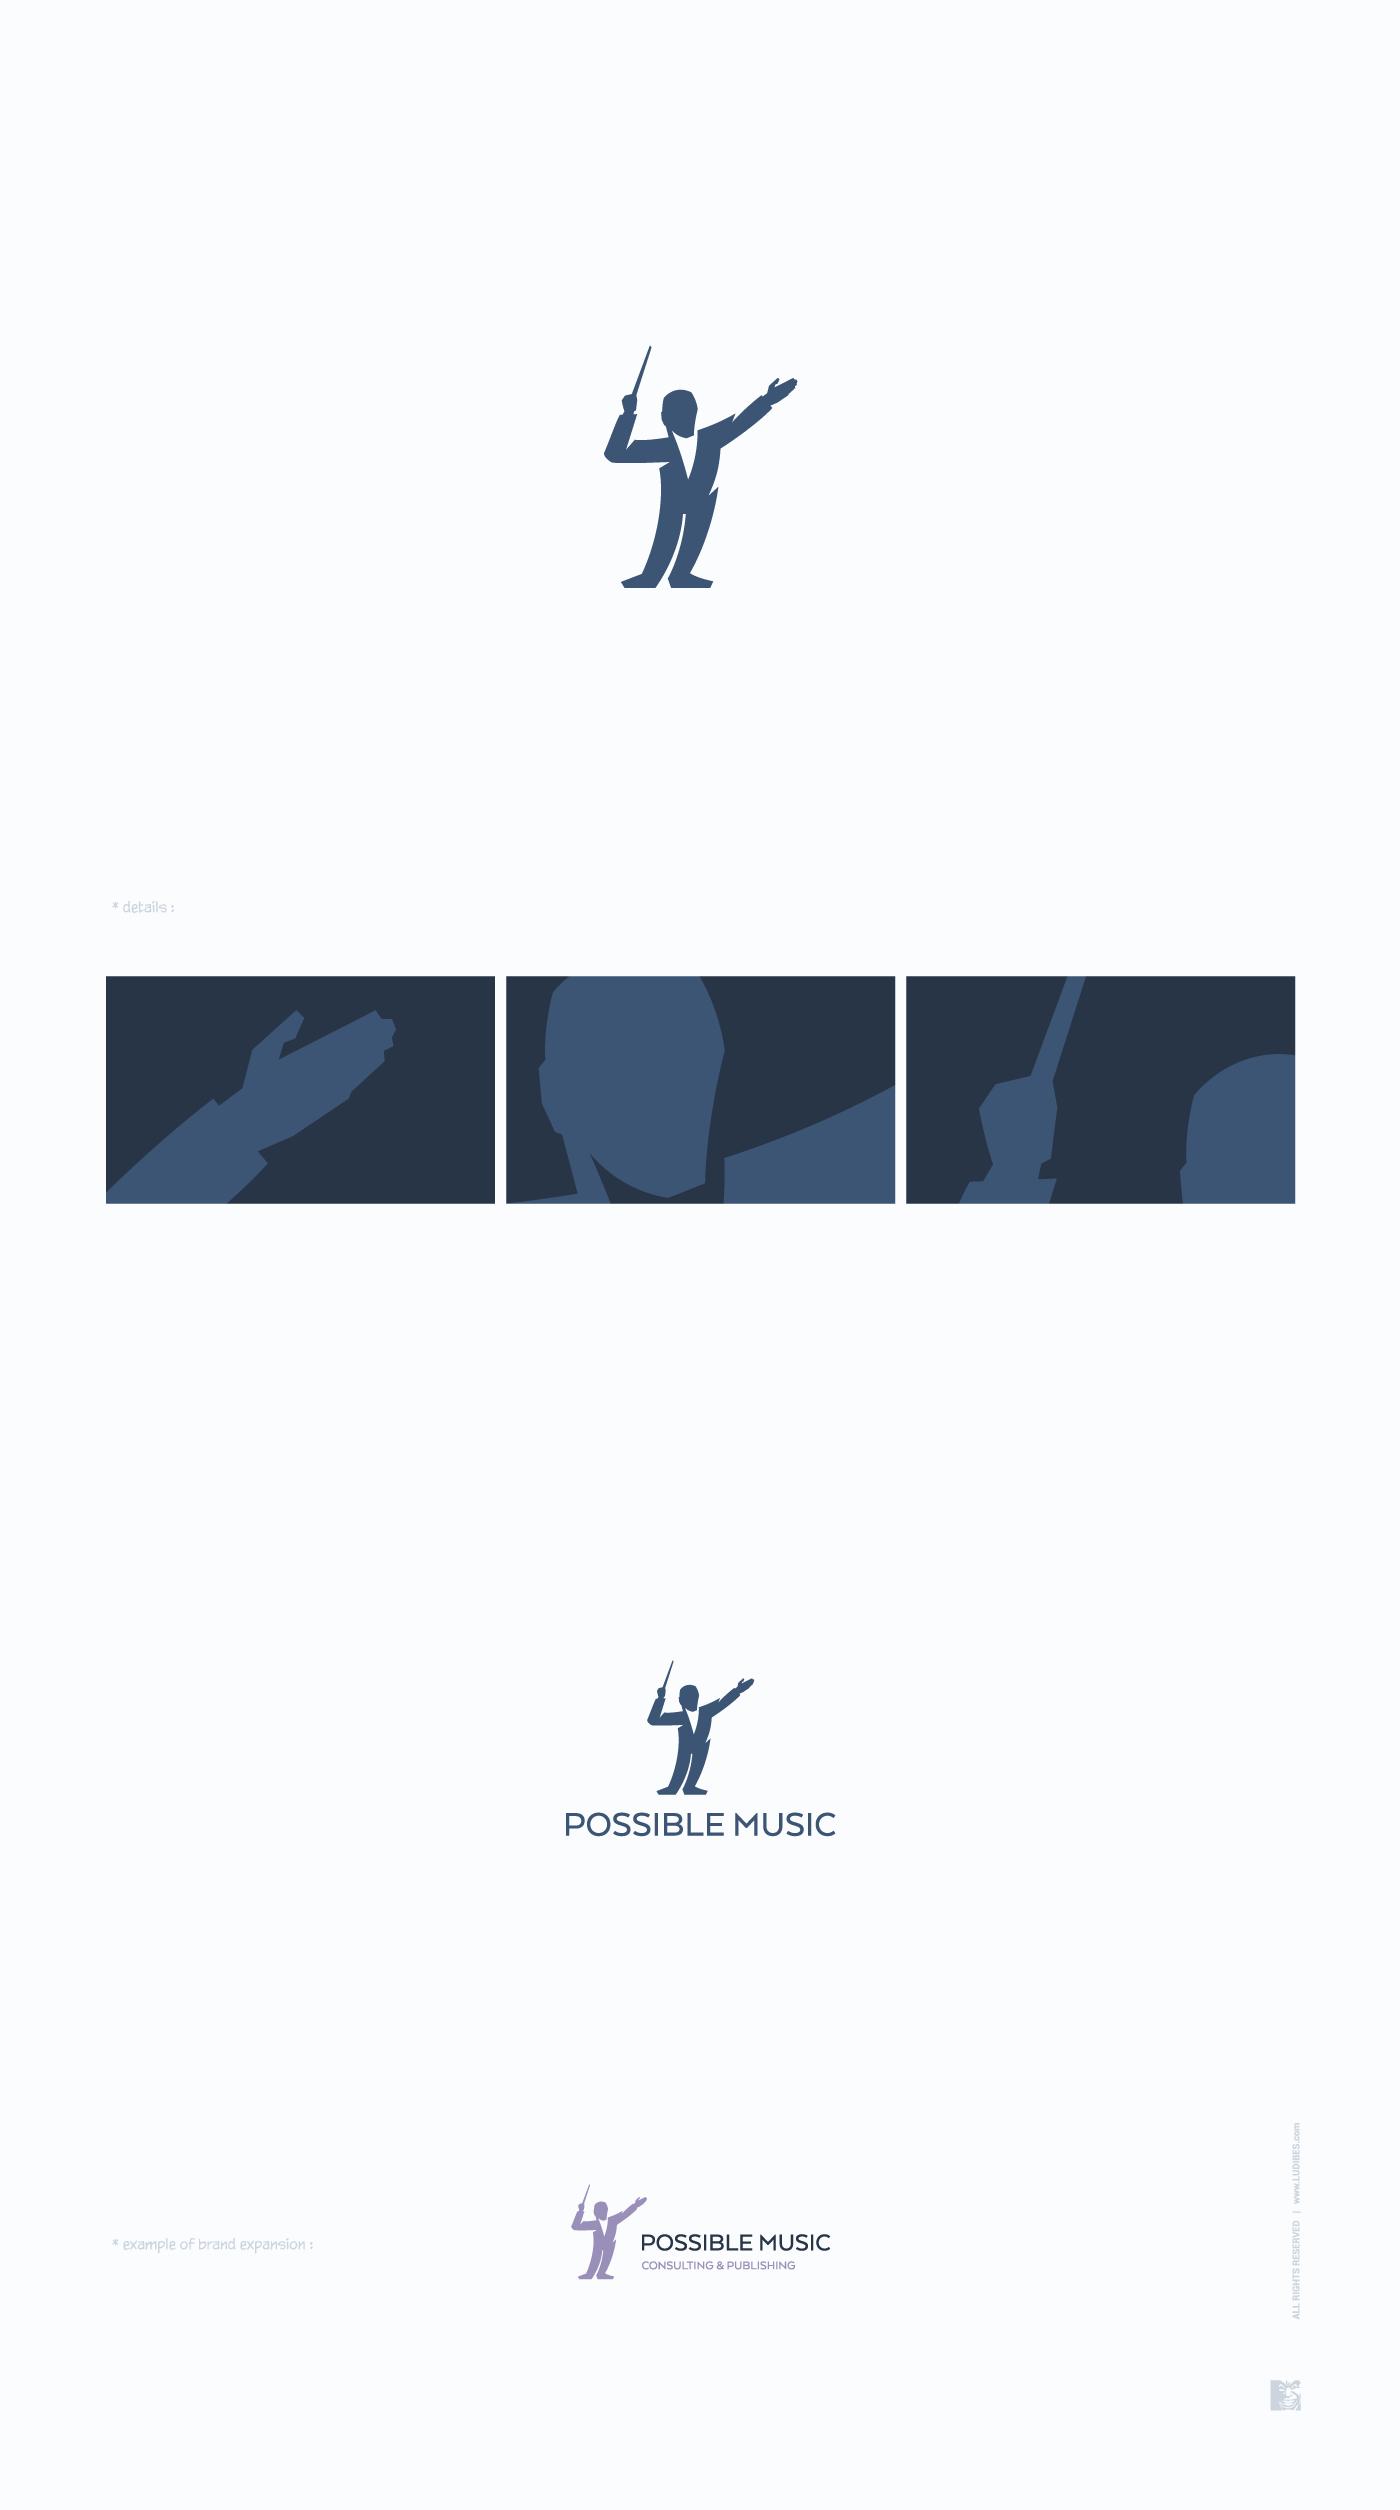 Possible Music Logo Design